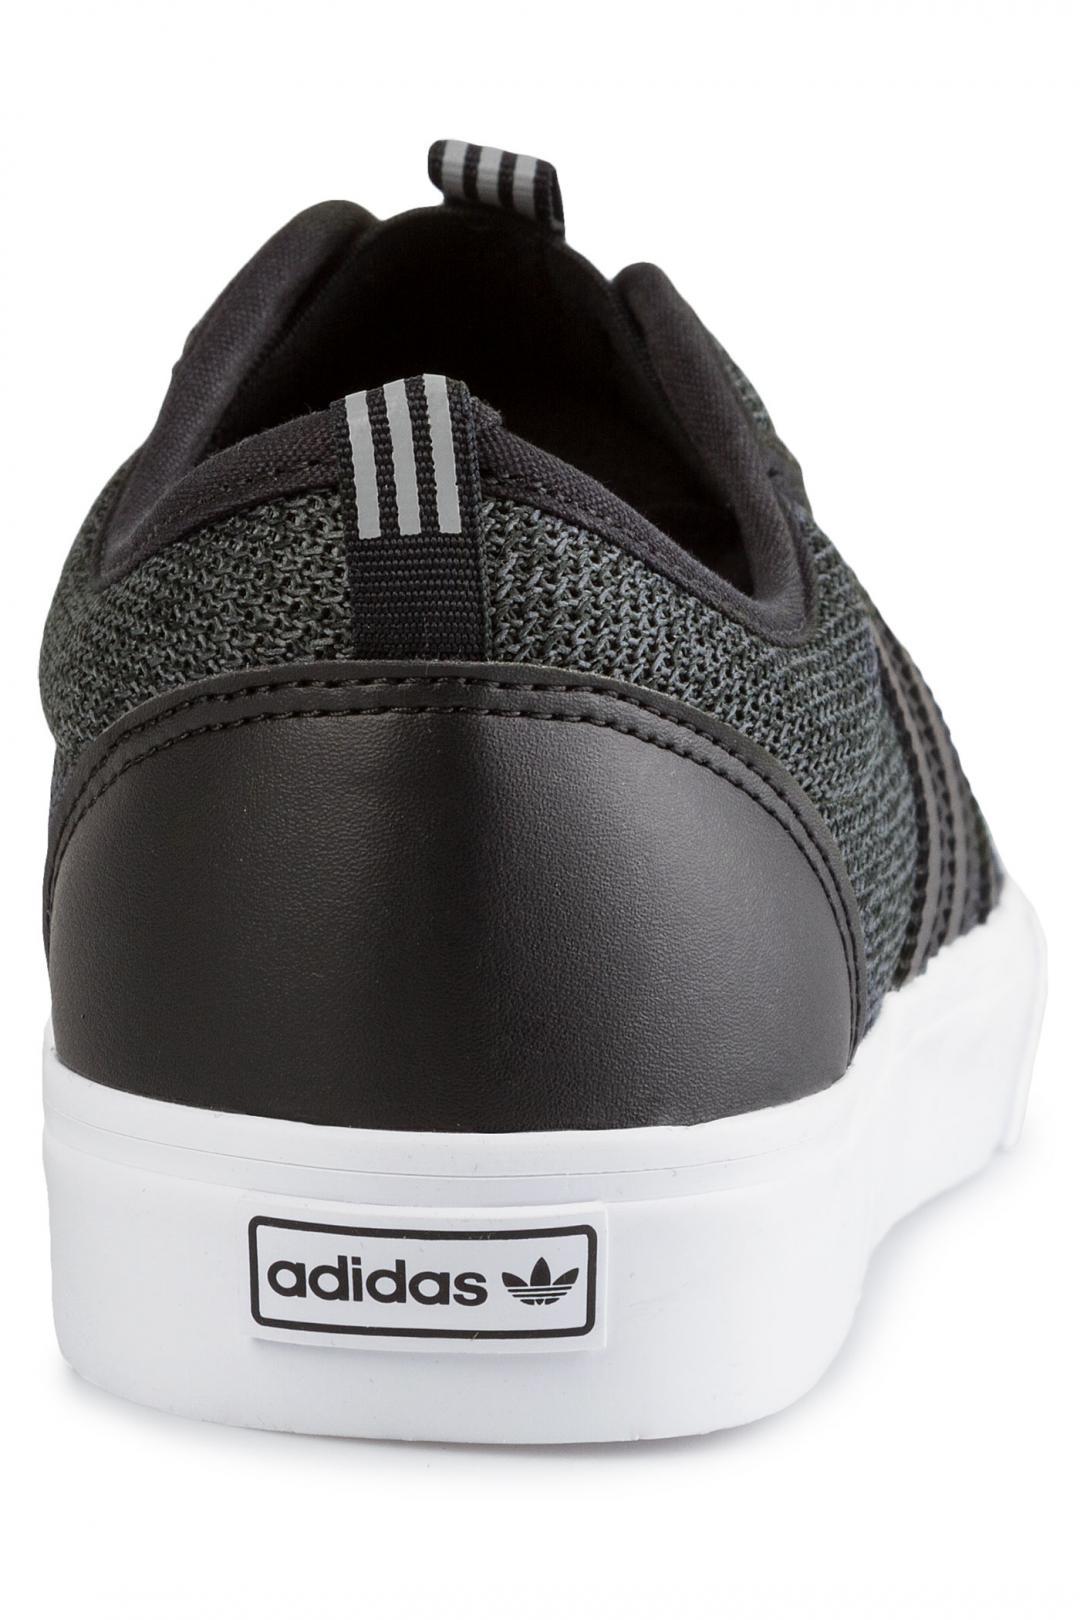 Uomo adidas Adi Ease Kung Fu core black grey white | Sneakers slip on